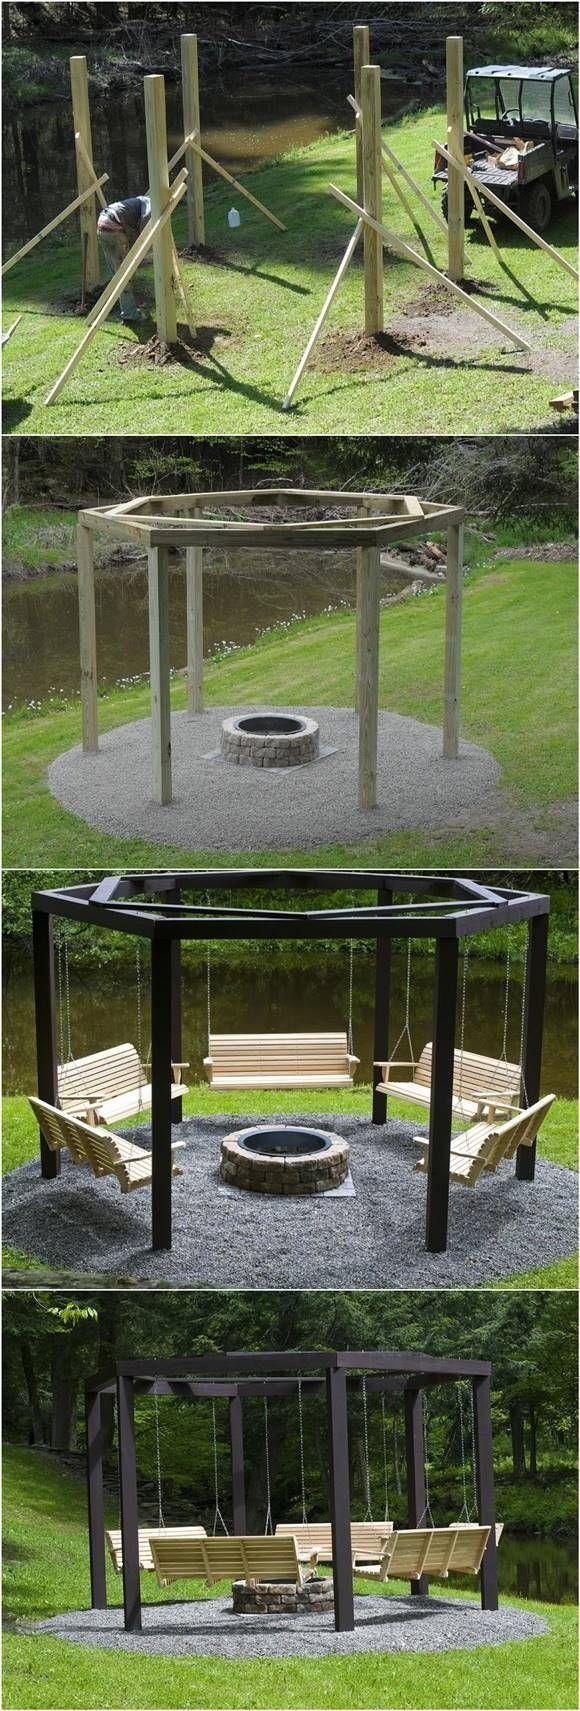 Marbella rattan garden furniture seater corner sofa set with glass